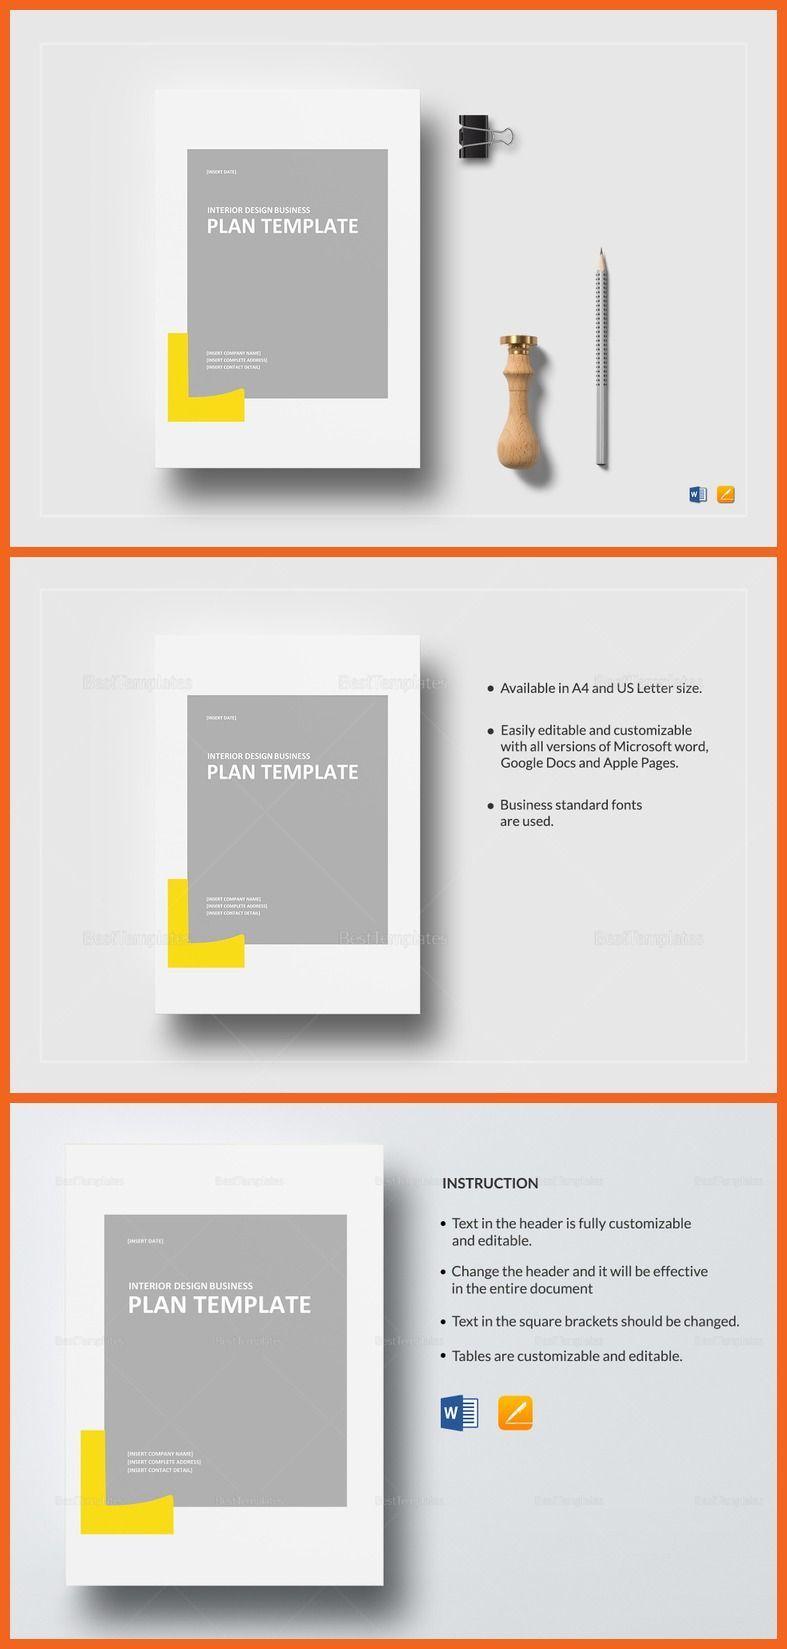 Interior Design Business Plan Template Interior design